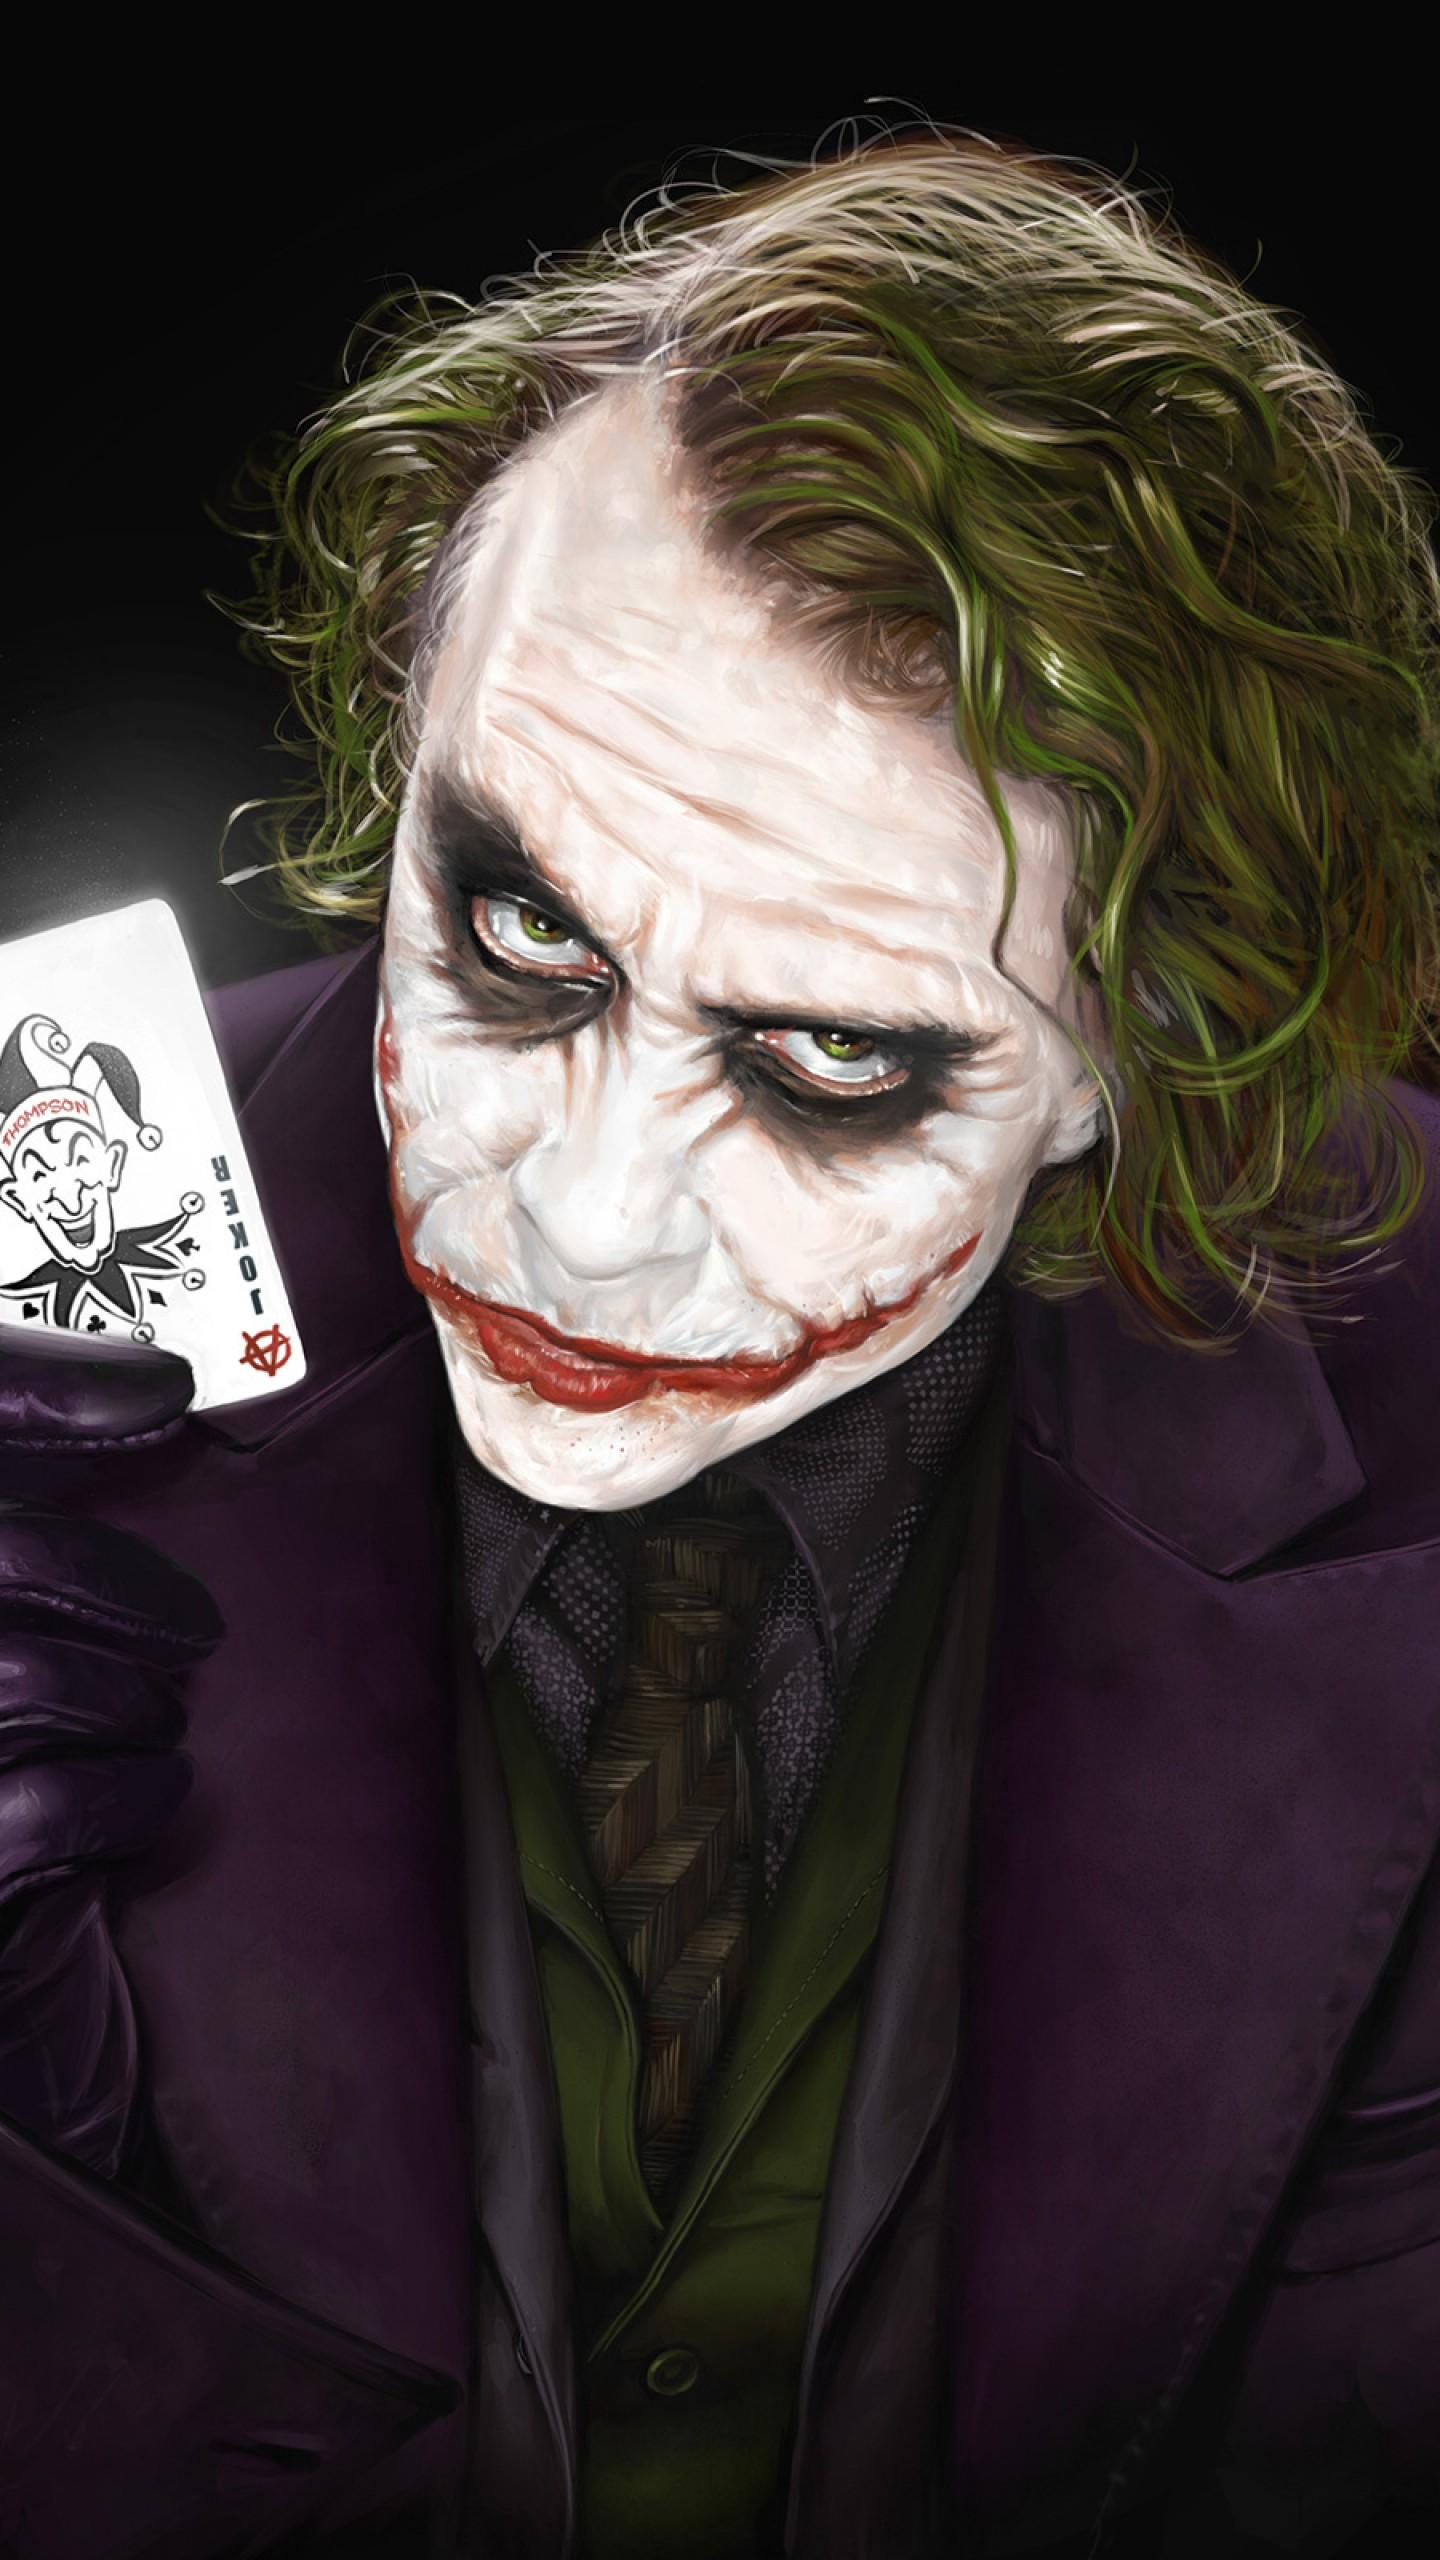 Black/dark / Joker Wallpaper - Dark Knight Joker Hd , HD Wallpaper & Backgrounds